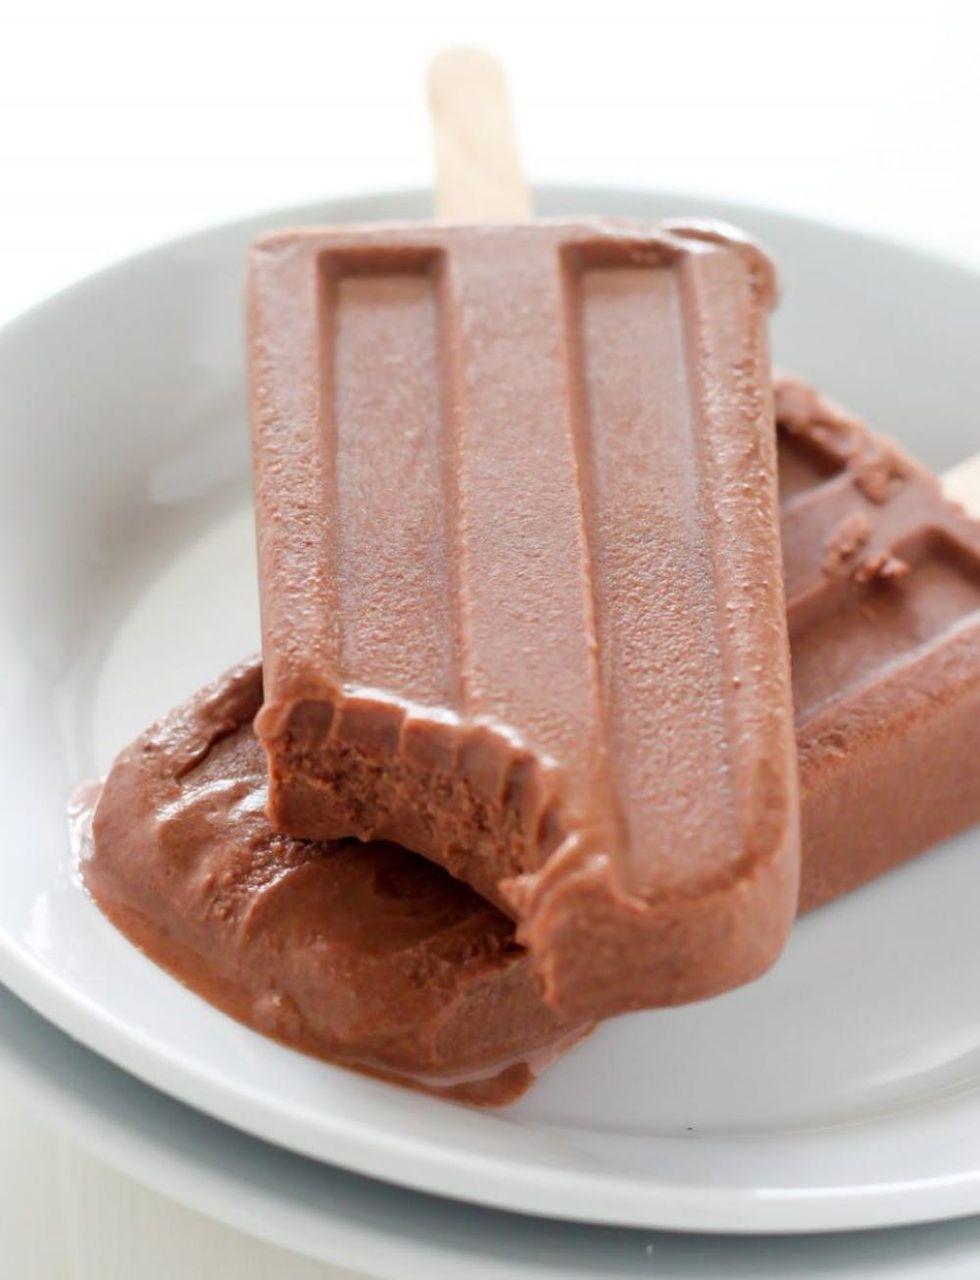 10 Low Carb Diabetes Friendly Dessert Recipes To Satisfy